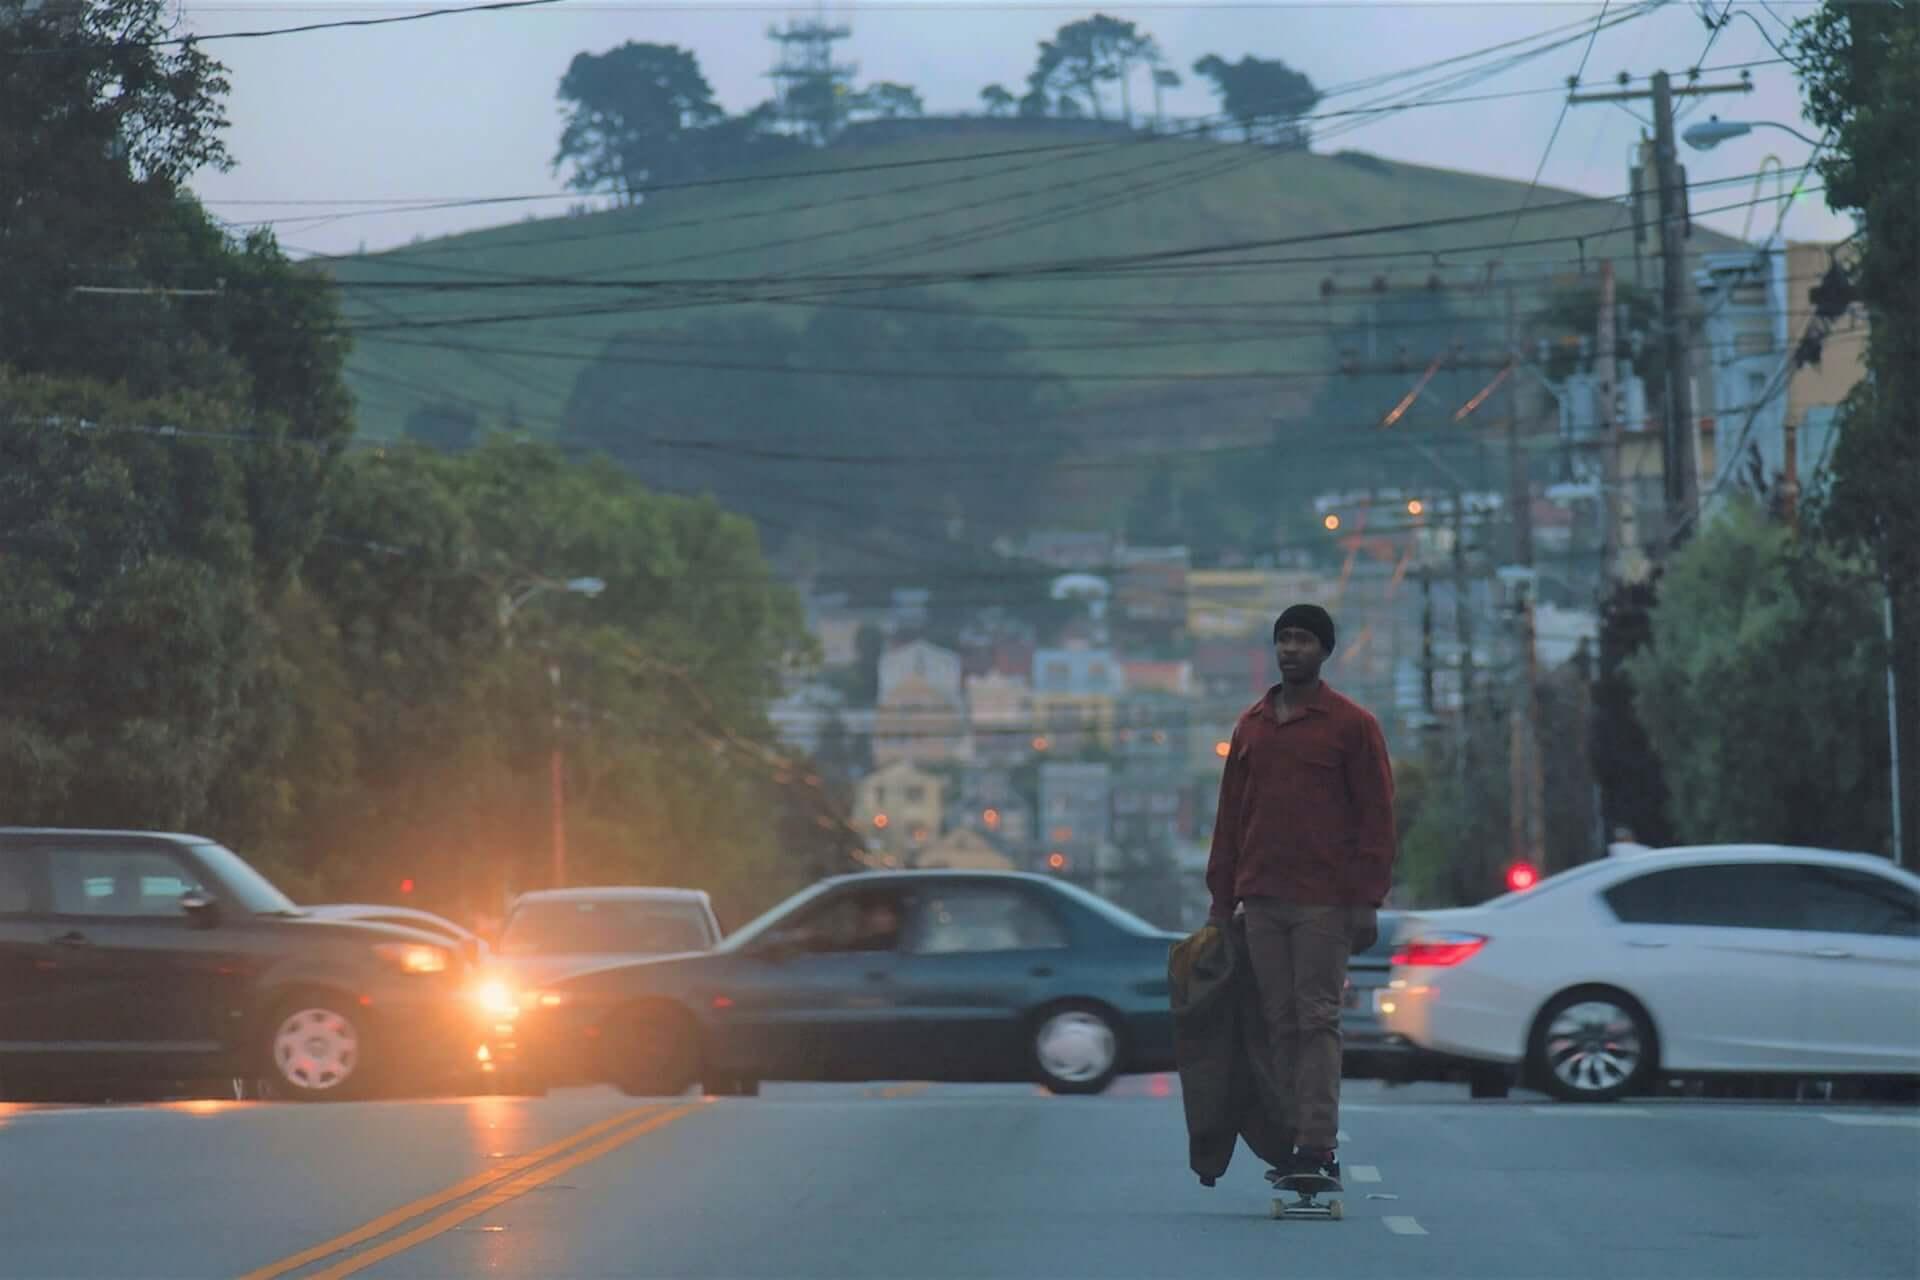 A24とプランBの再タッグとなる最新作『ラストブラックマン・イン・サンフランシスコ』新場面写真が解禁!ジョー・タルボット監督のコメントも到着 film200808_lastblackman_2-1920x1280